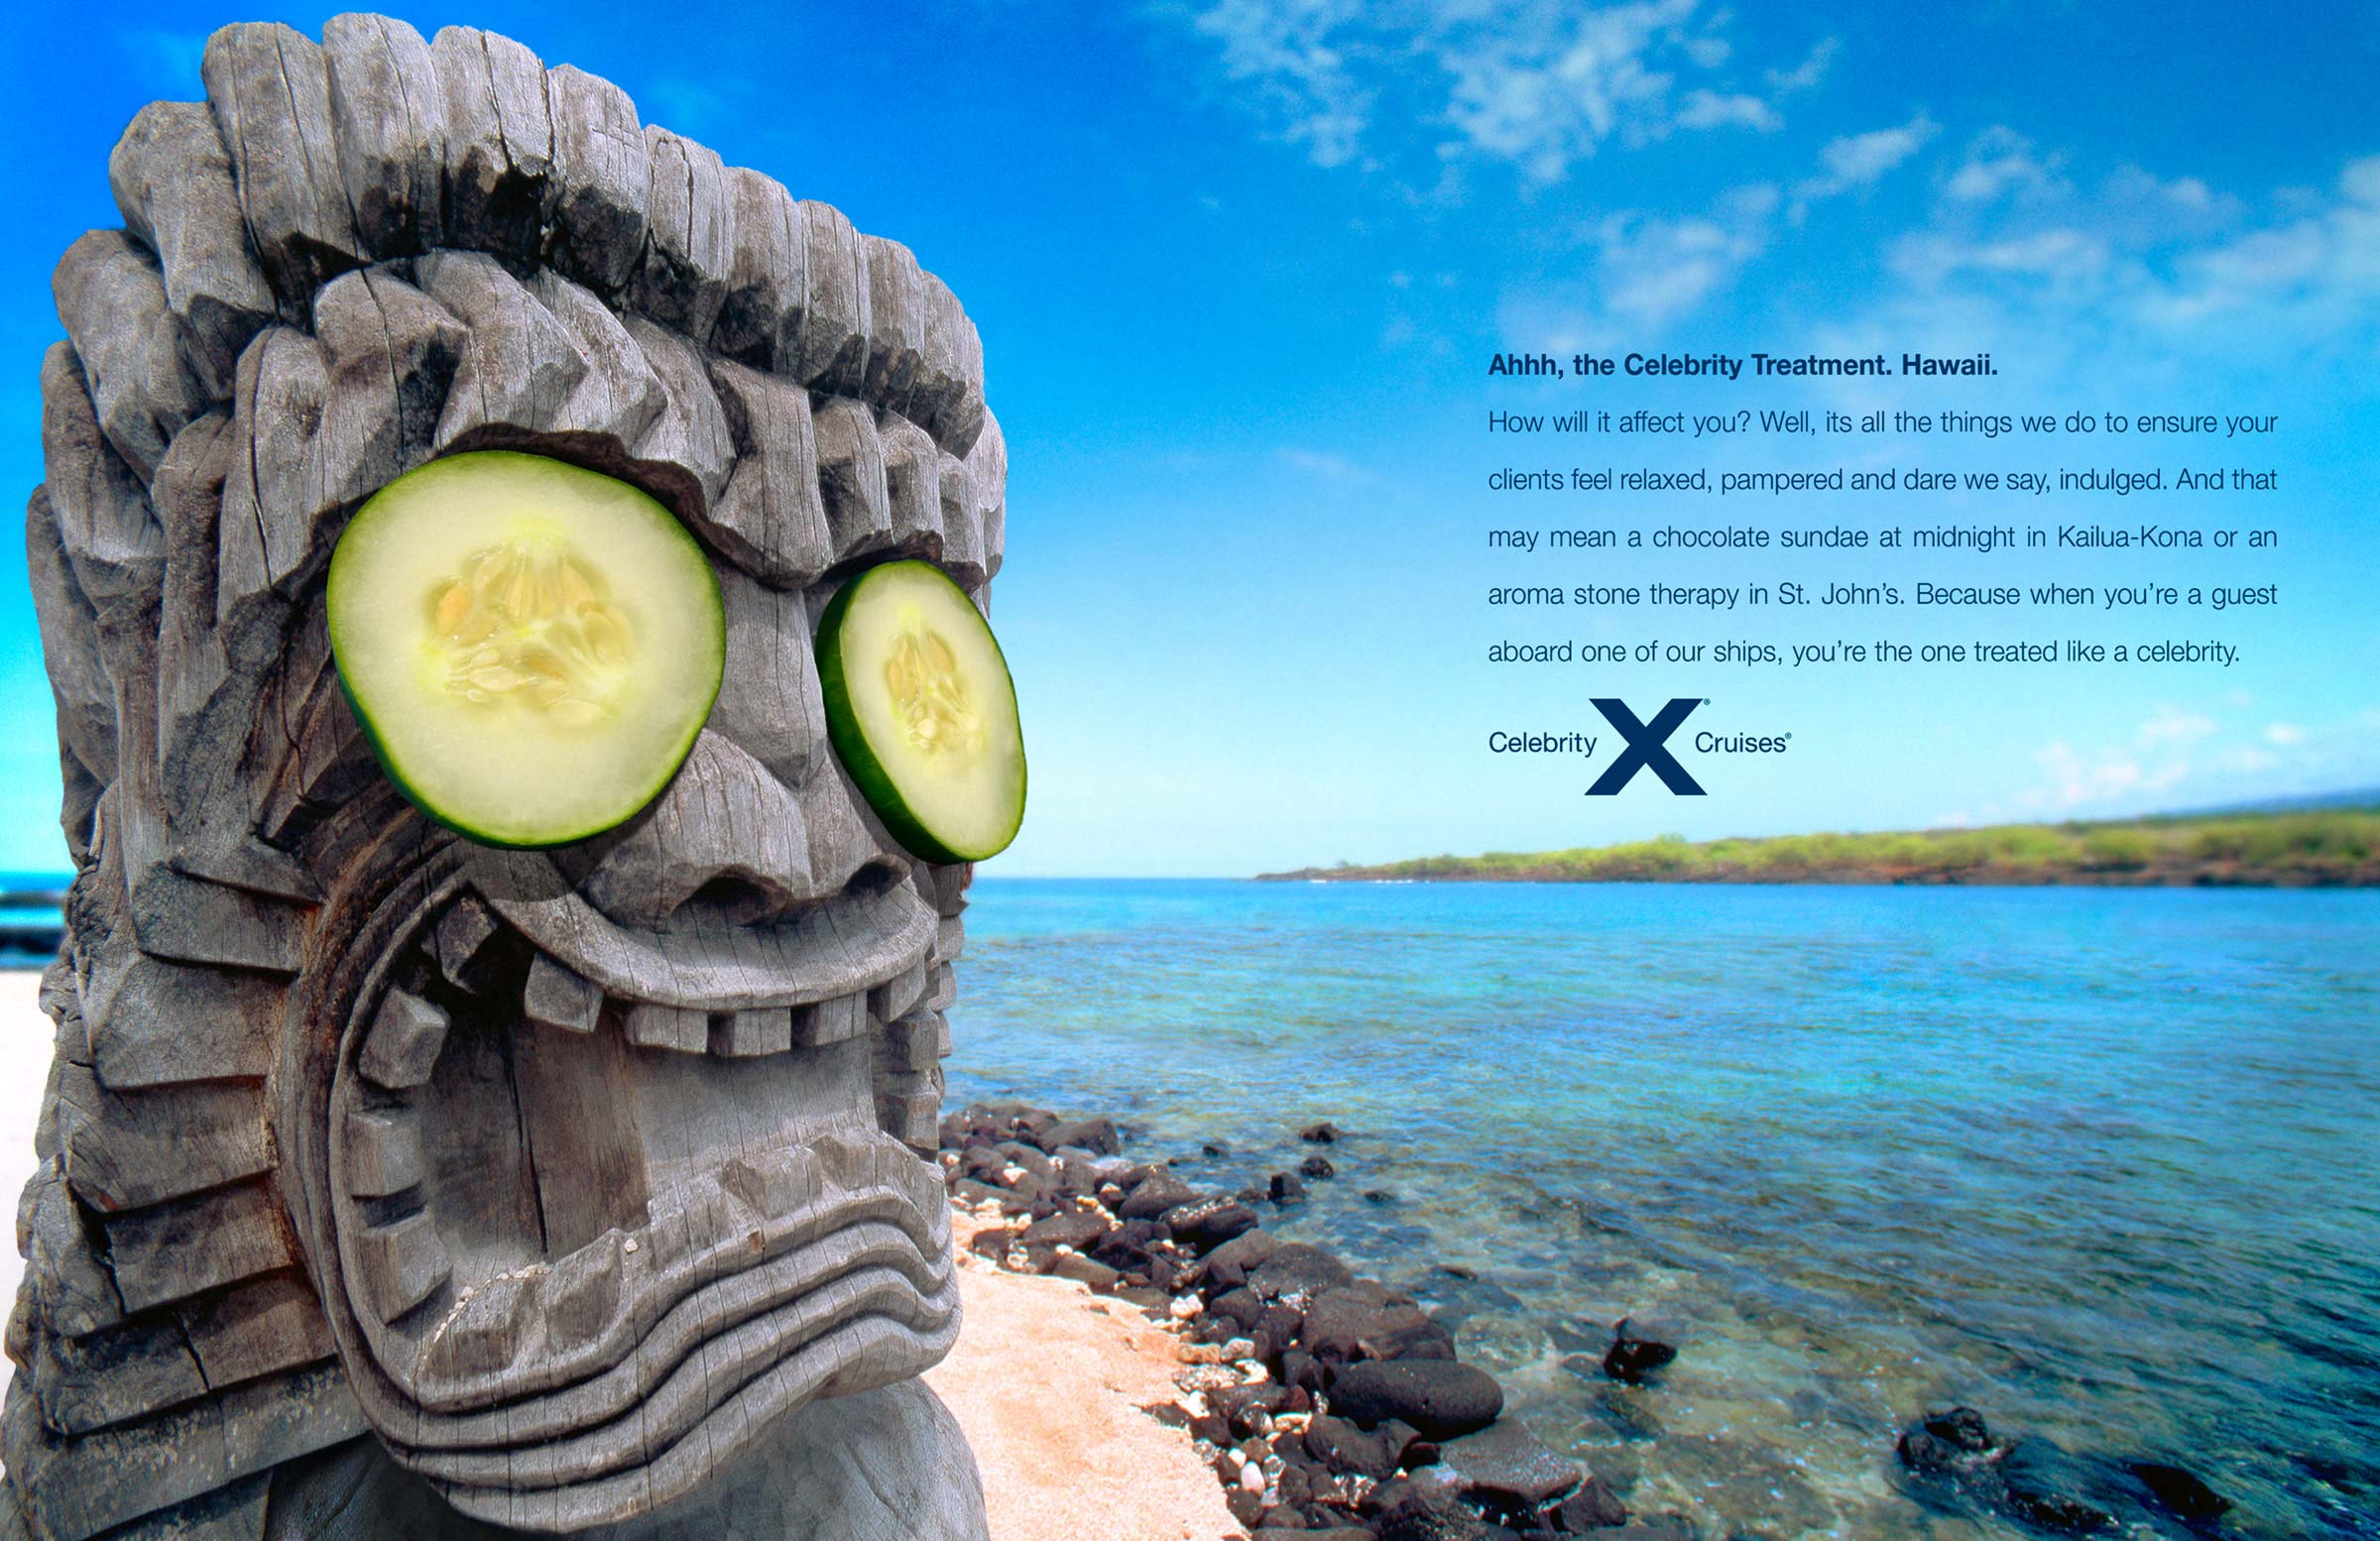 Celebrity Treatment Hawaii